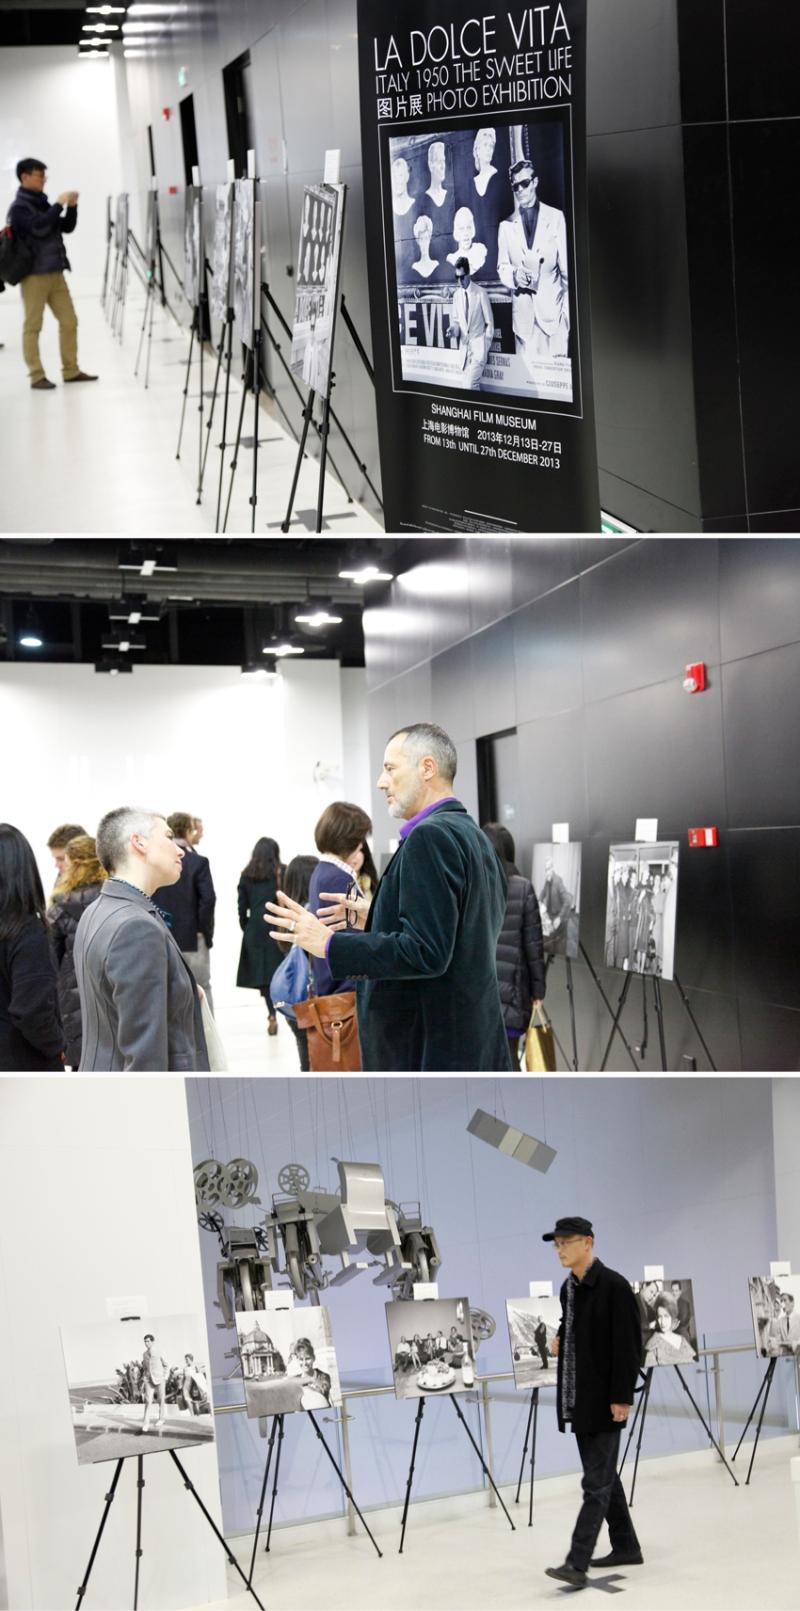 mostra museo cinema